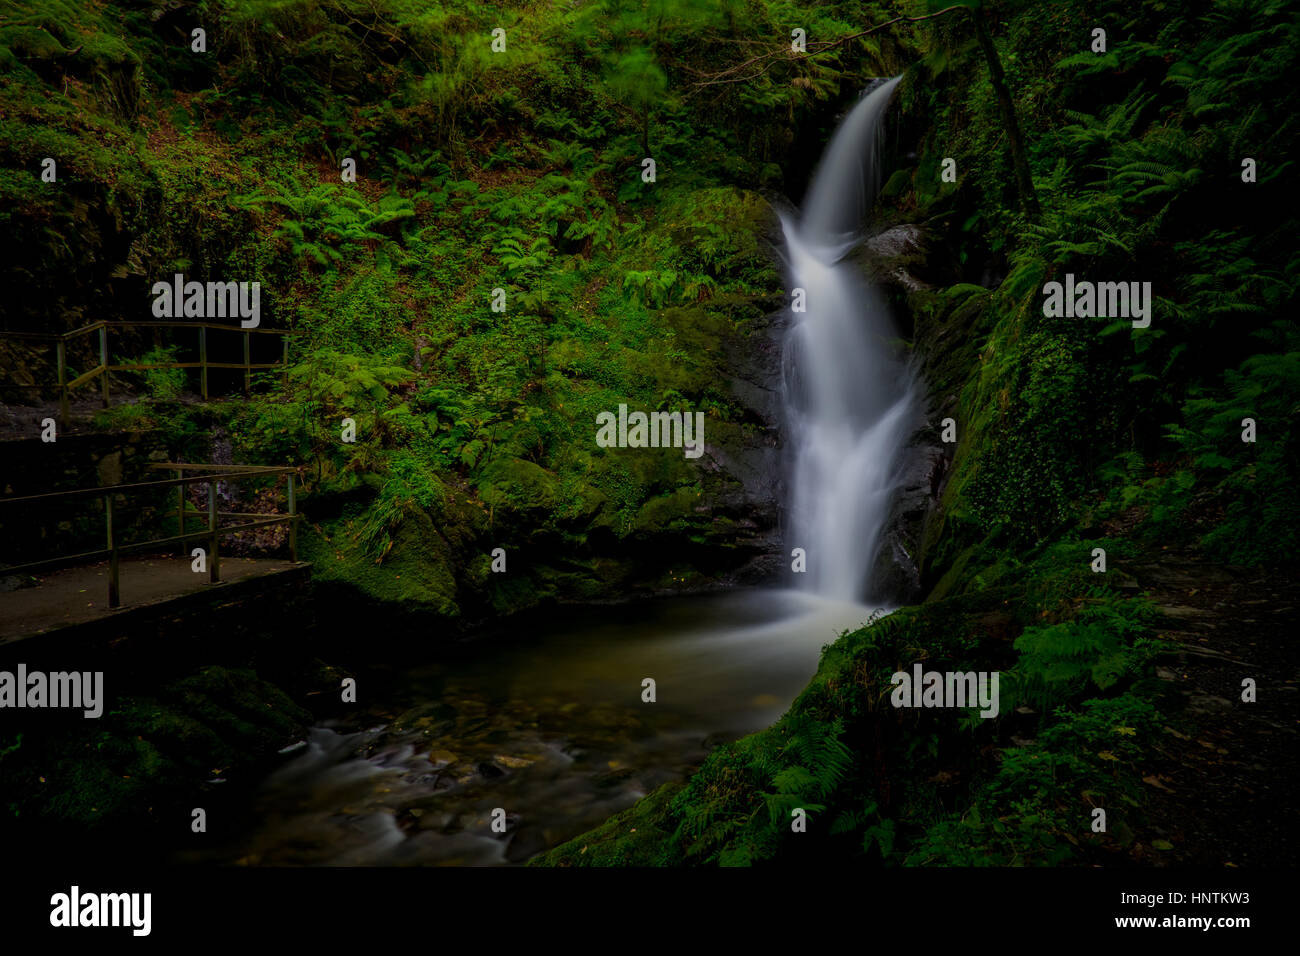 Welsh waterfall - Stock Image